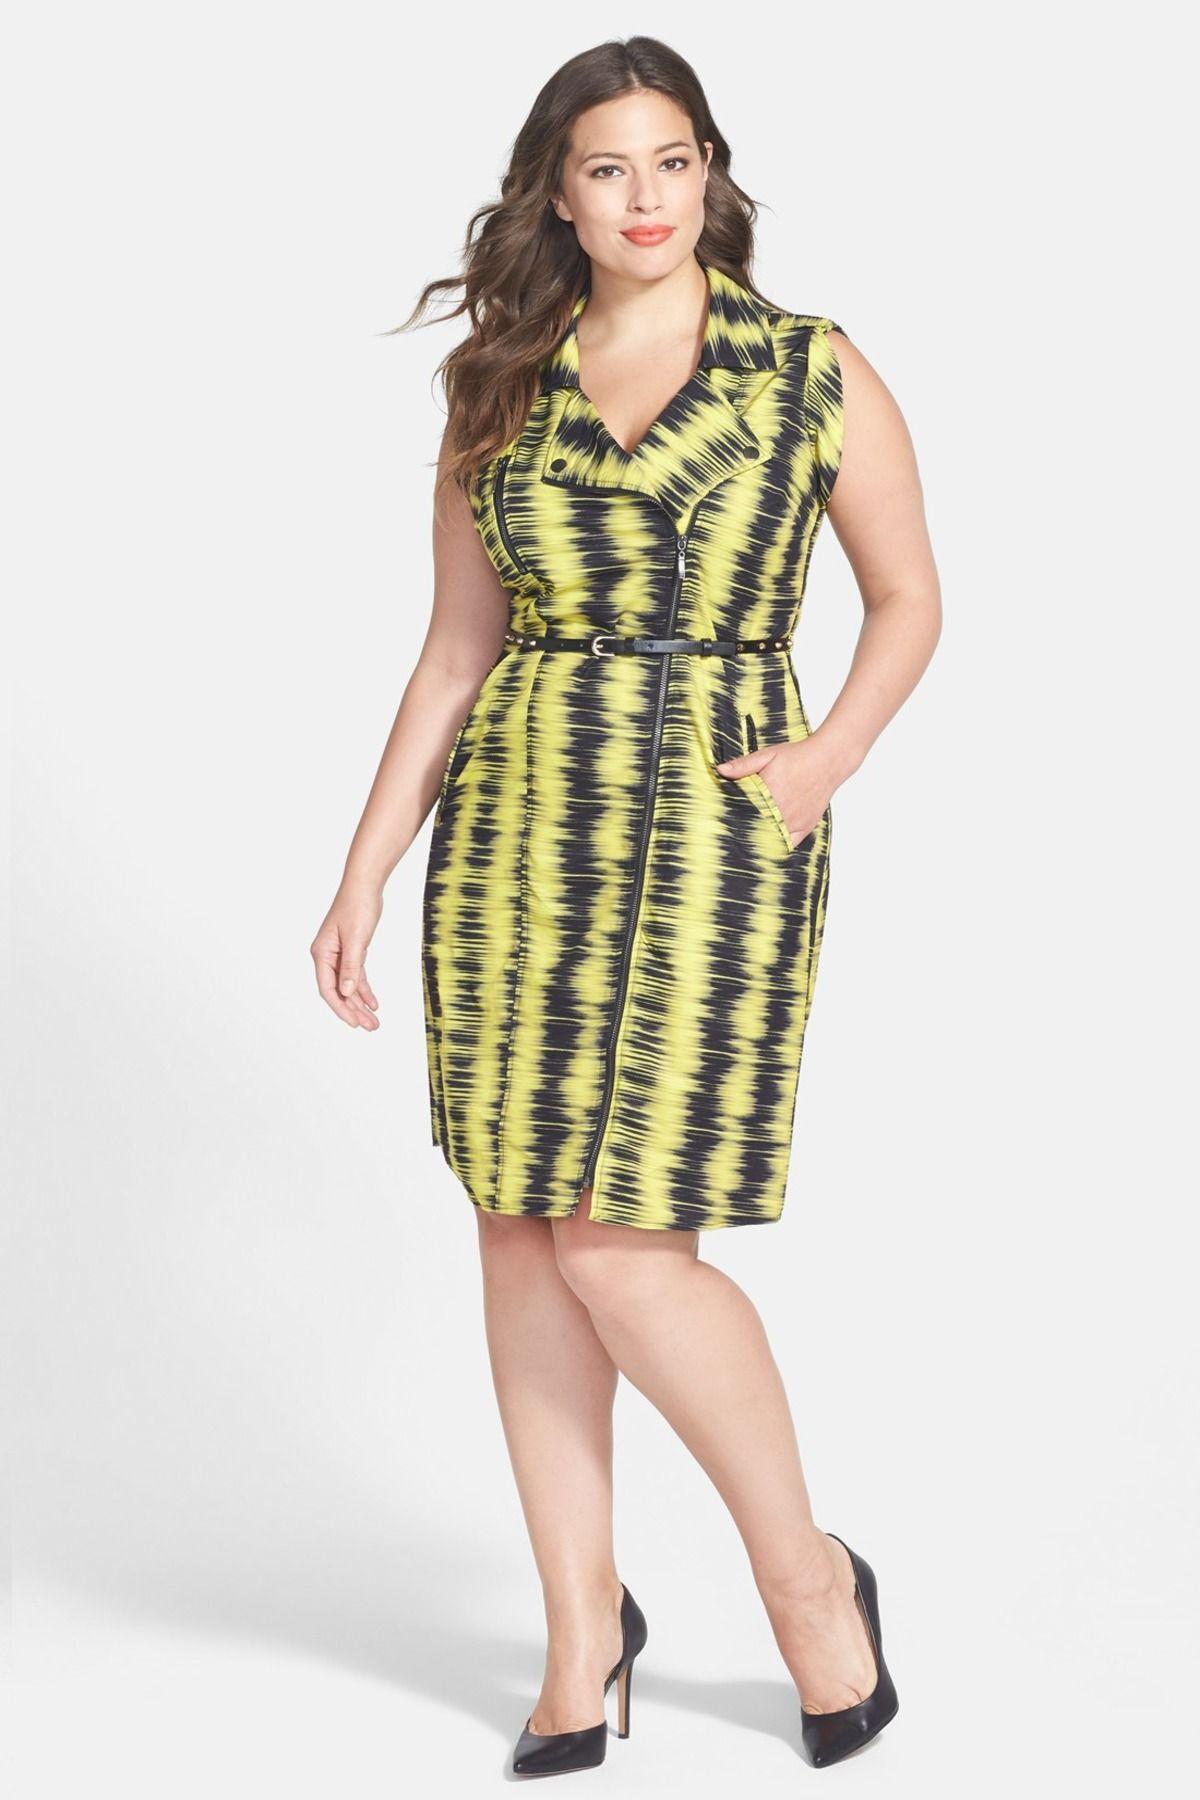 Feel The Beat Zip Front Dress Plus Size Zip Front Dress City